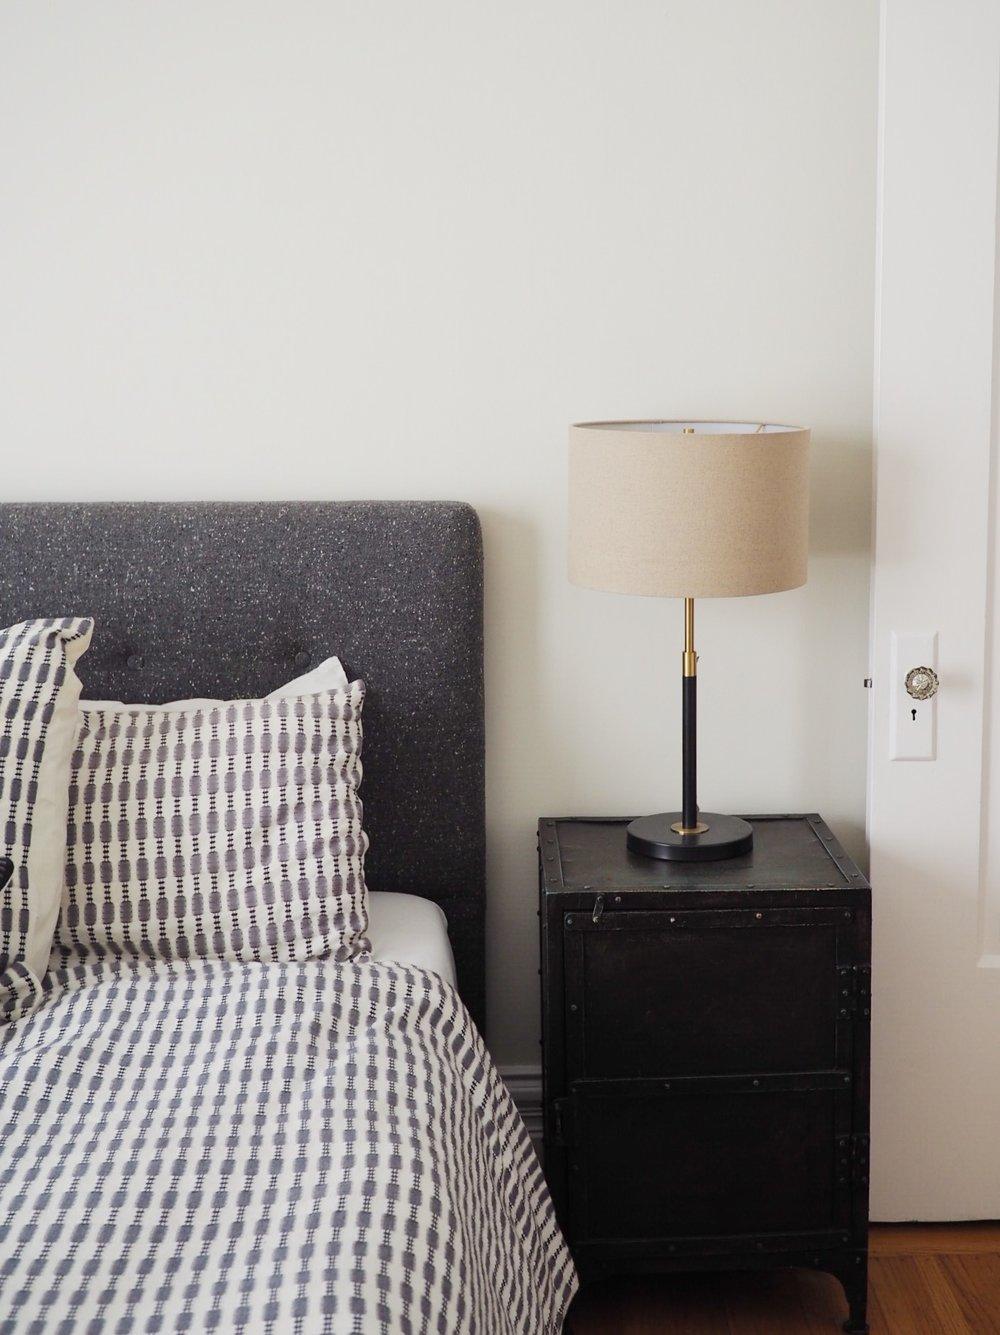 Nightstands: Restoration Hardware ( similar ). Bed:  West Elm . Bedding: West elm ( similar ). Lamp:  West Elm .